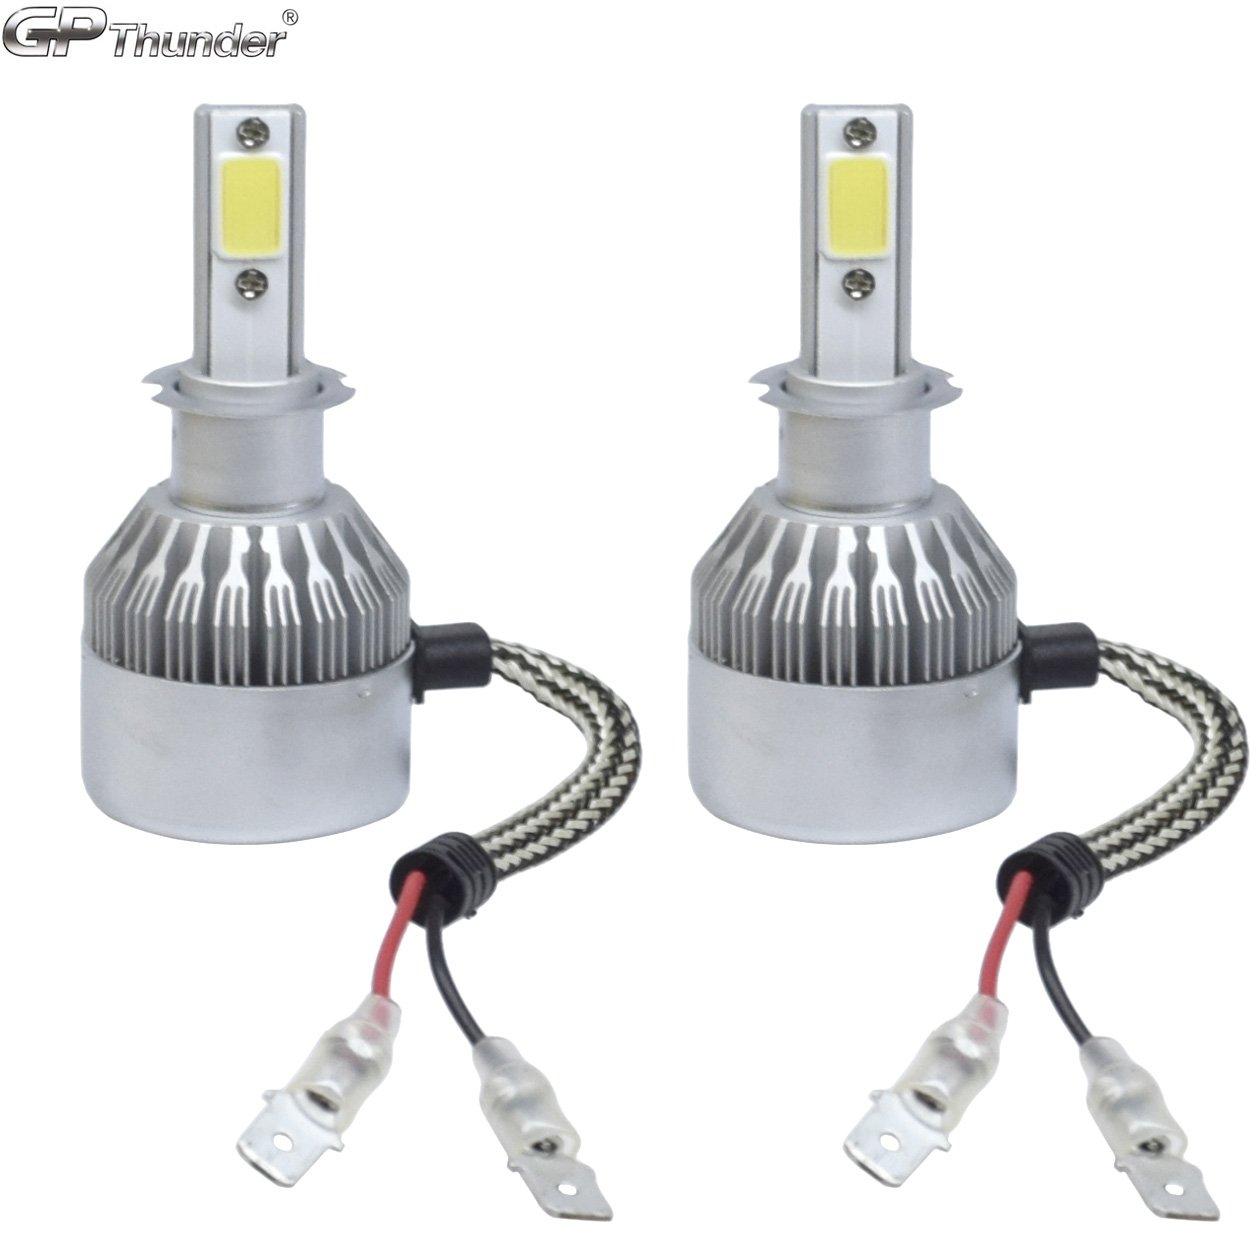 2 Pack GP Thunder GP-LH-H3 Headlight Bulb 80W 6000K 8000LM For Low or High Beam or Fog Light